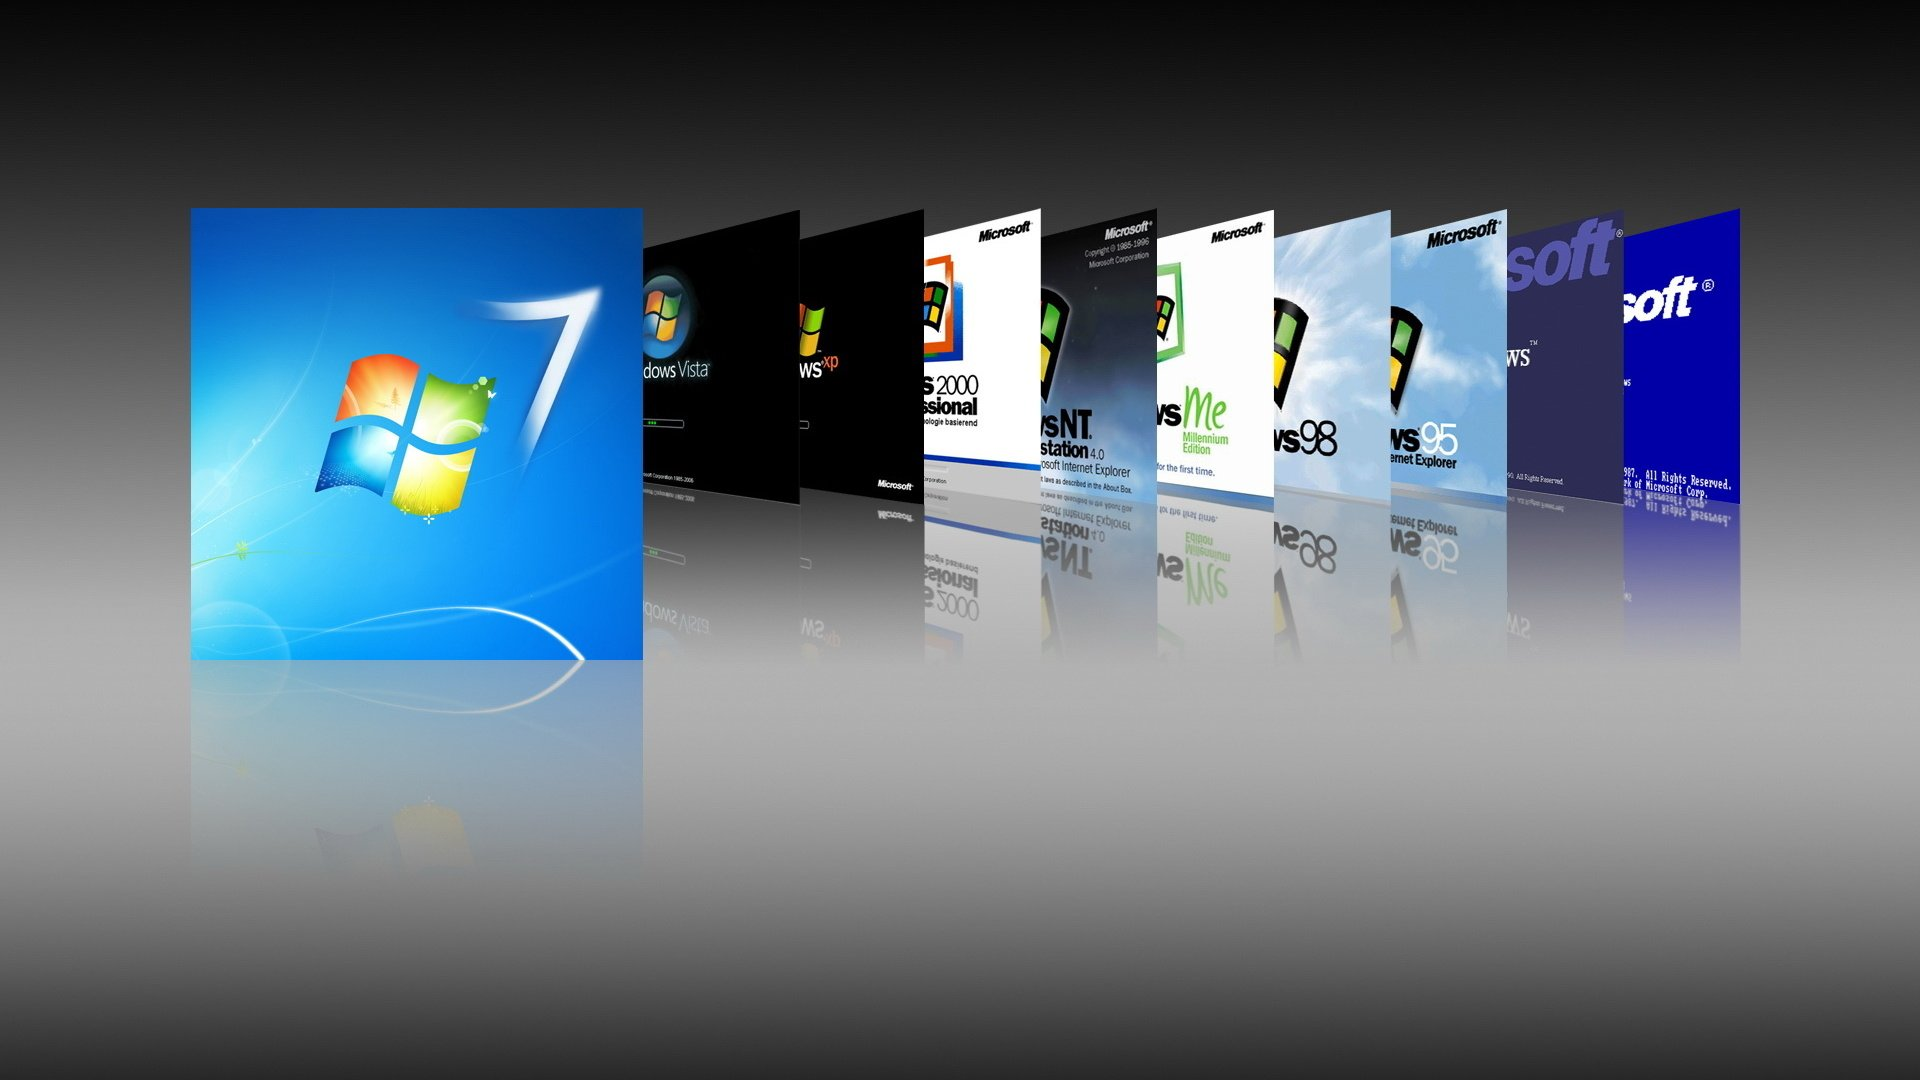 Microsoft computer wallpapers desktop backgrounds 1920x1080 voltagebd Choice Image